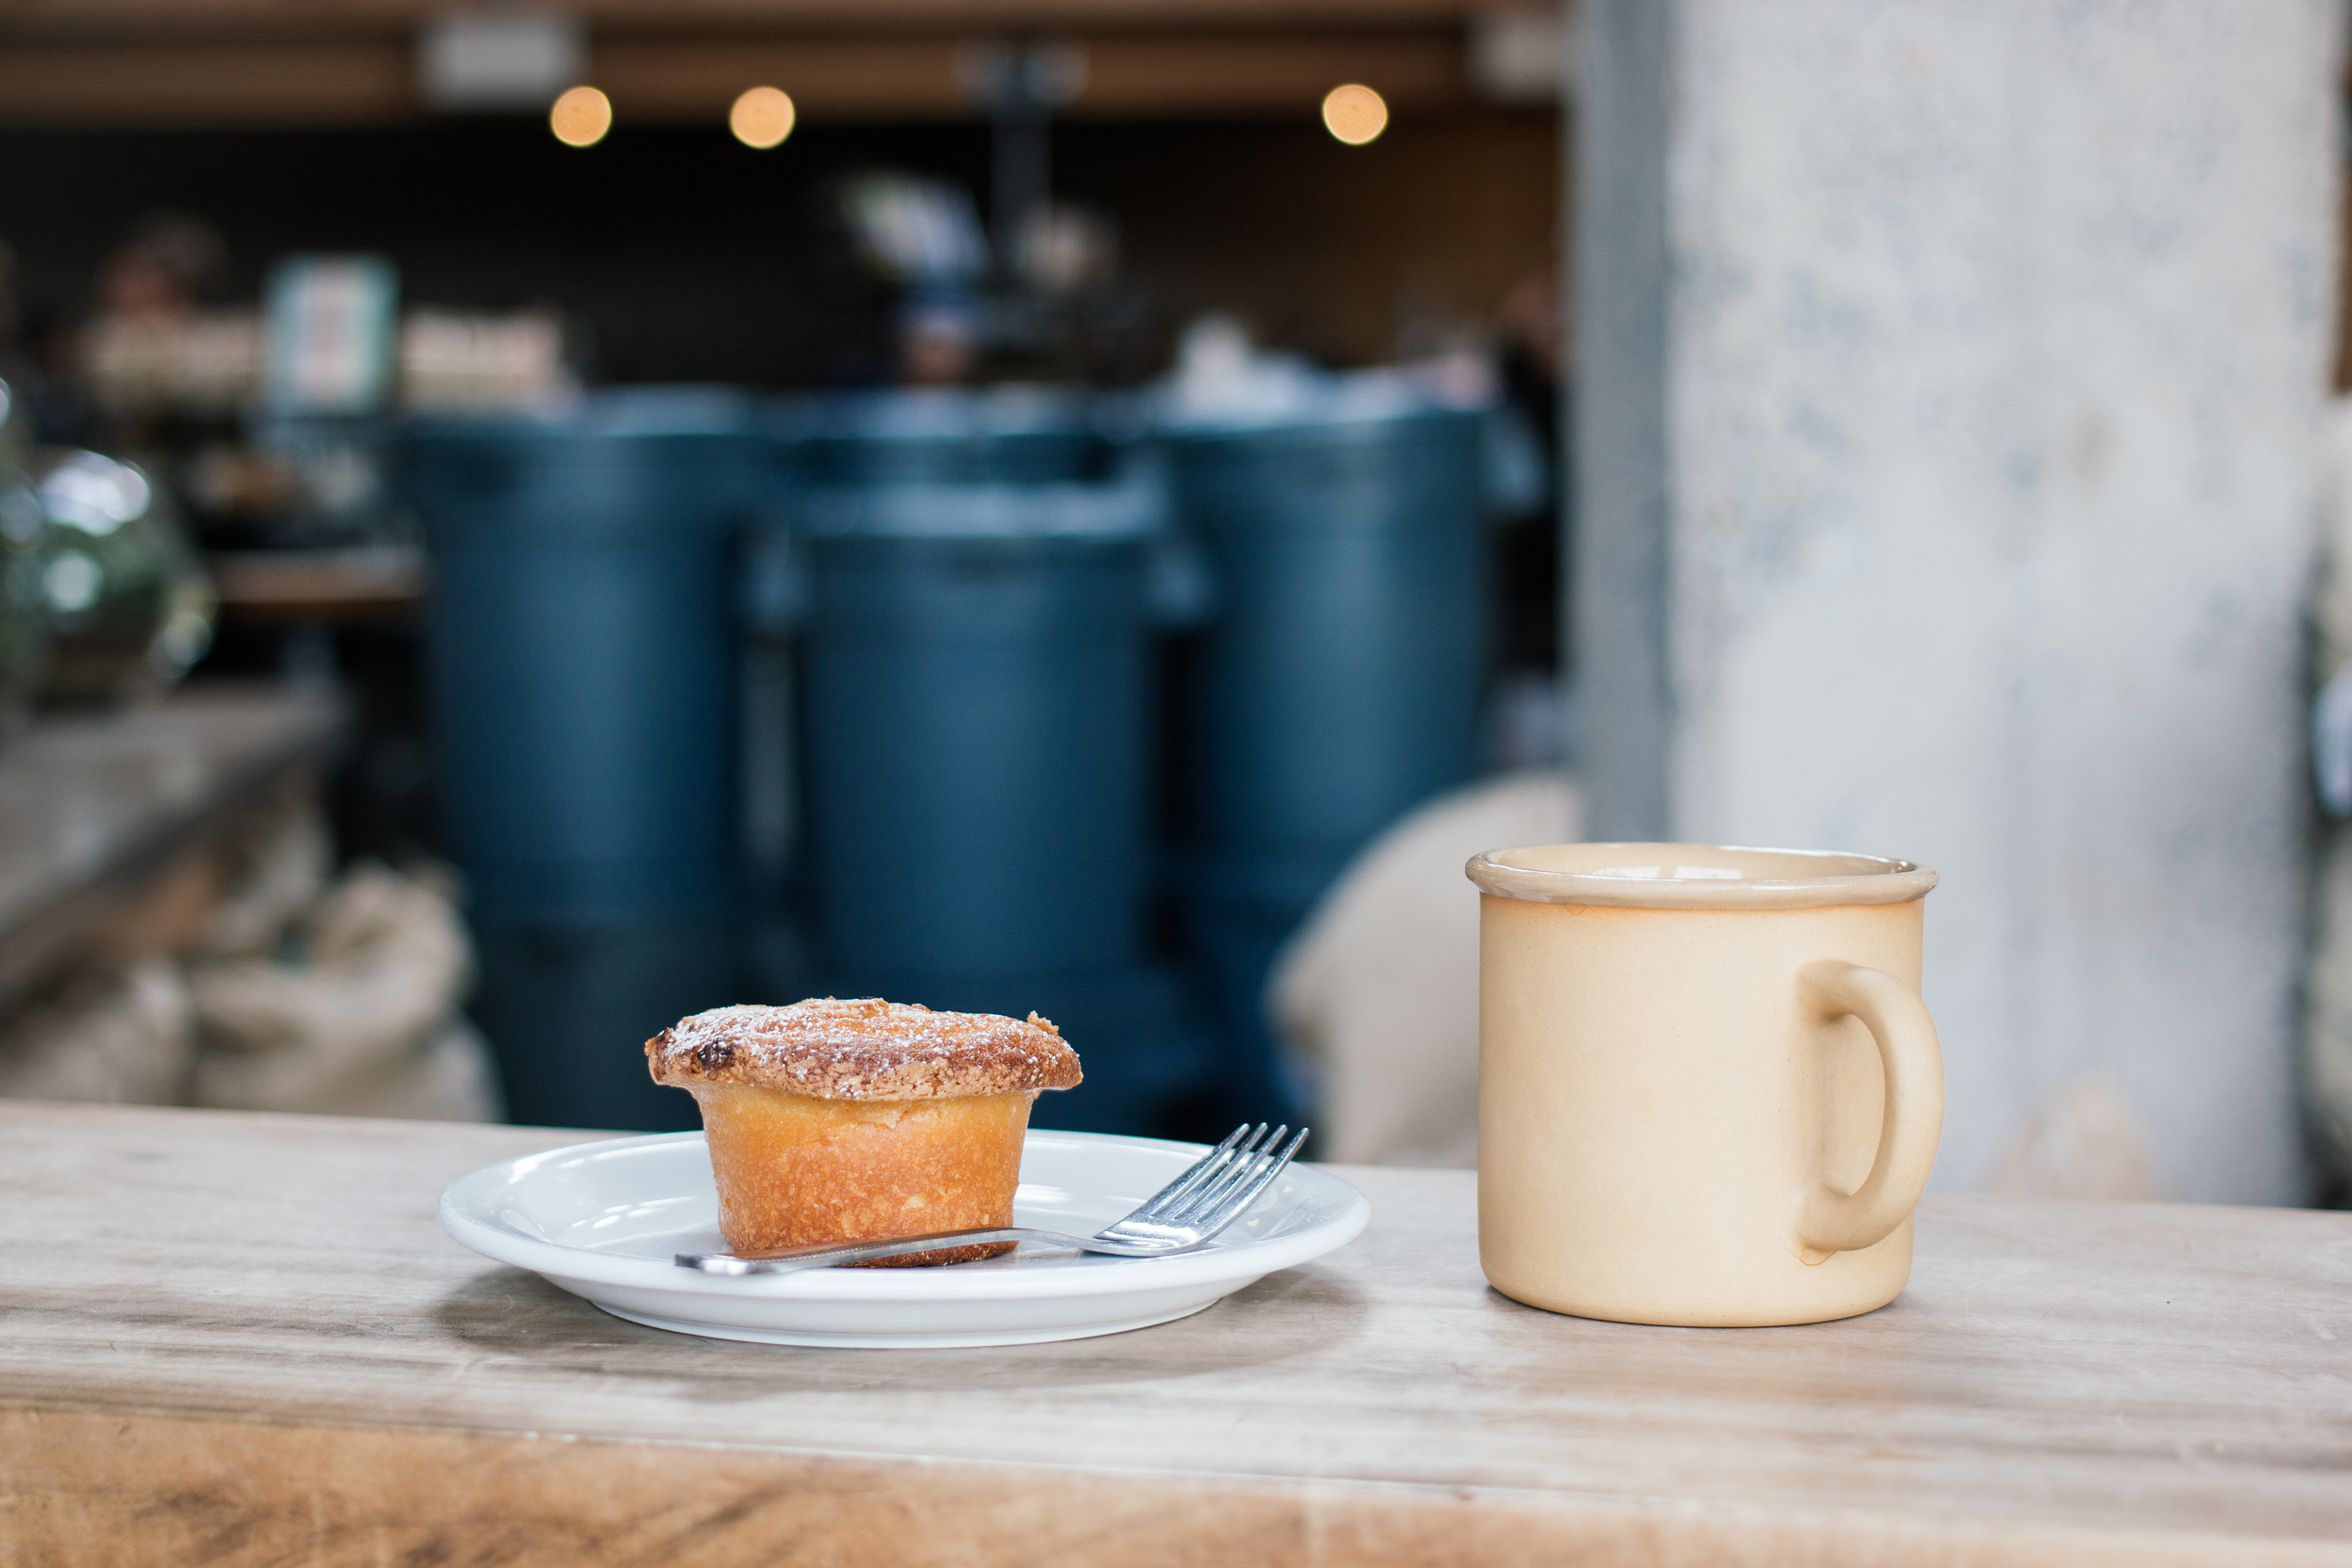 Apple Cinnamon Muffin and Drip Coffee at  Sightglass Coffee